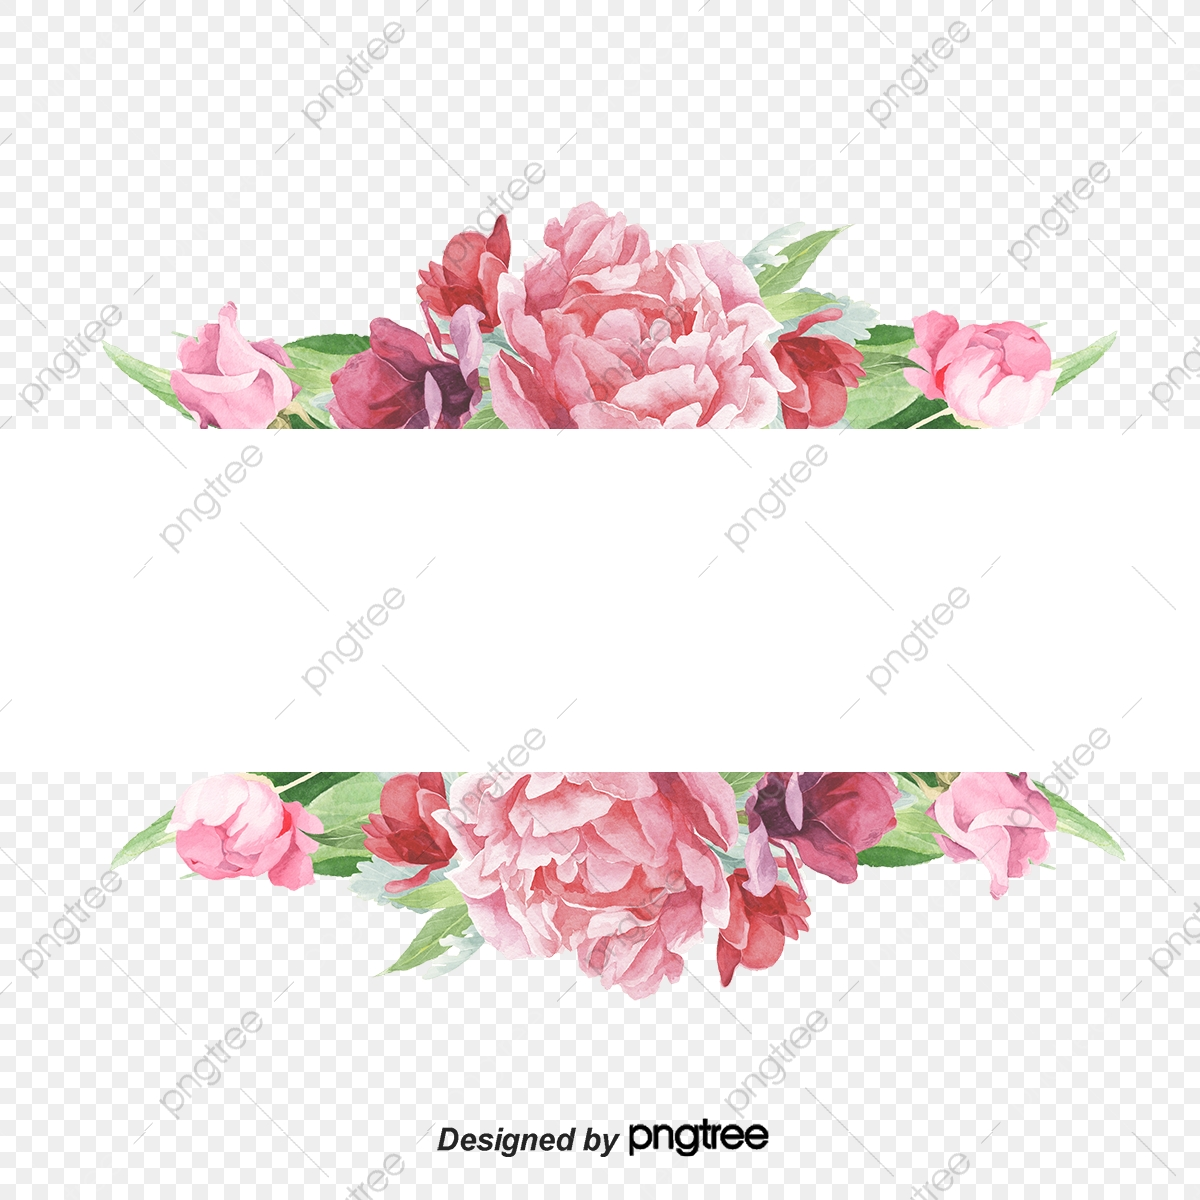 Eses Elemento Del Borde De Flores De Rosa Rosa Reposo